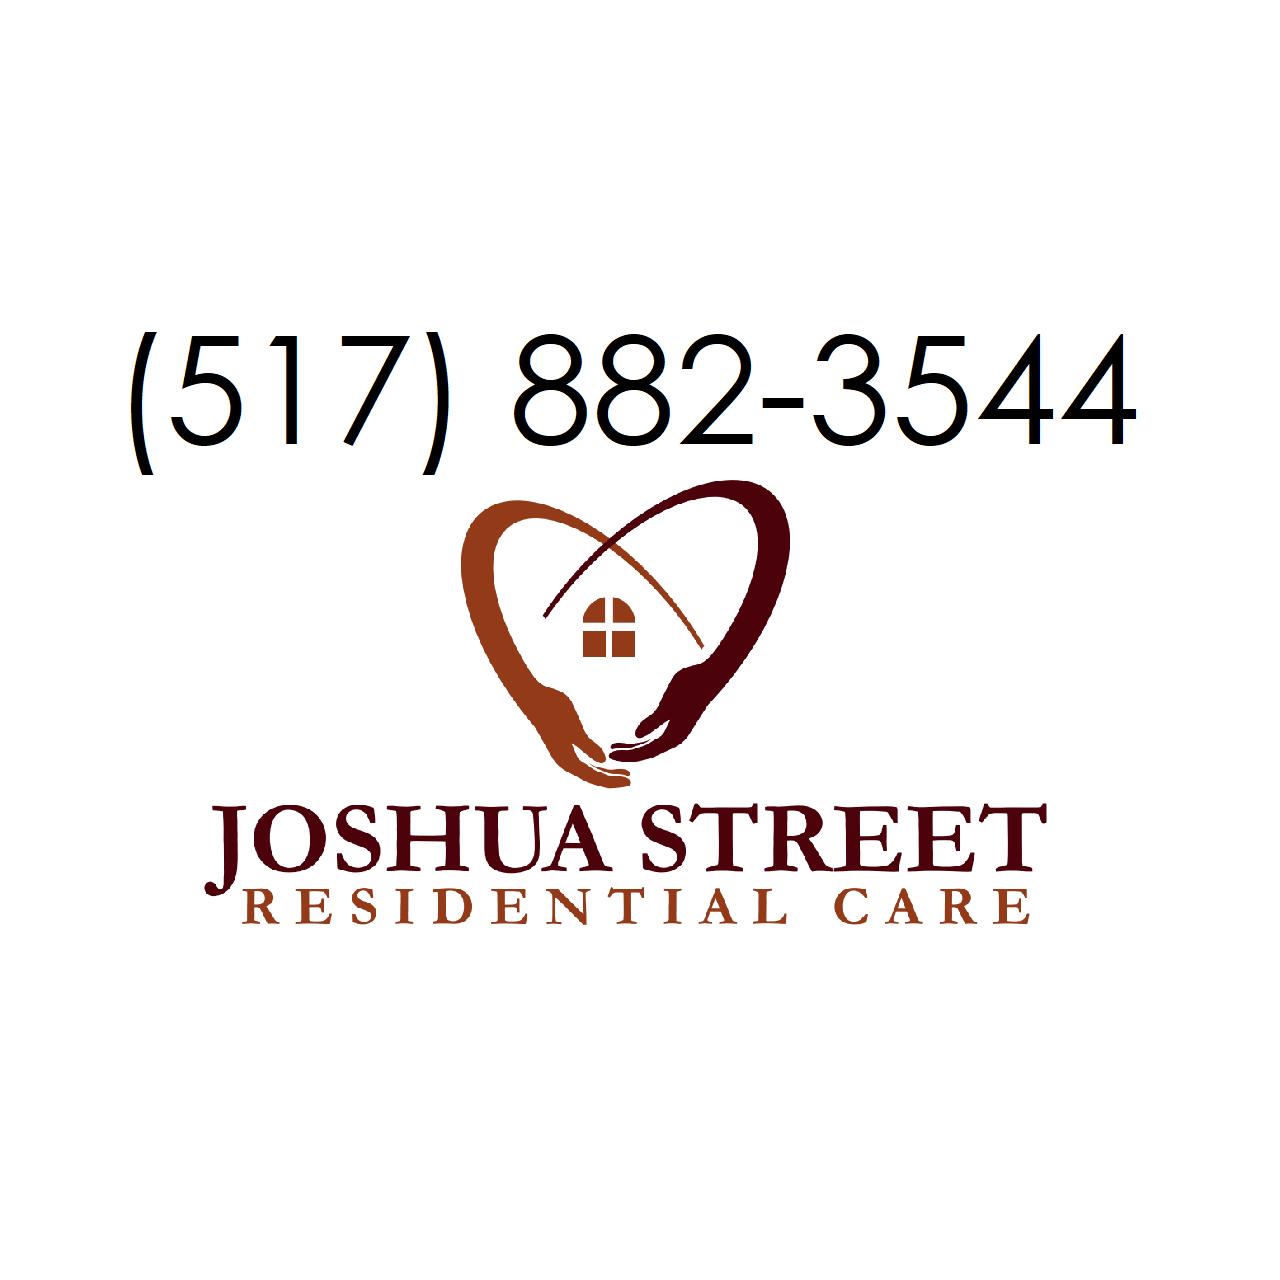 Joshua Street Residential Care & Rehabilitation Services